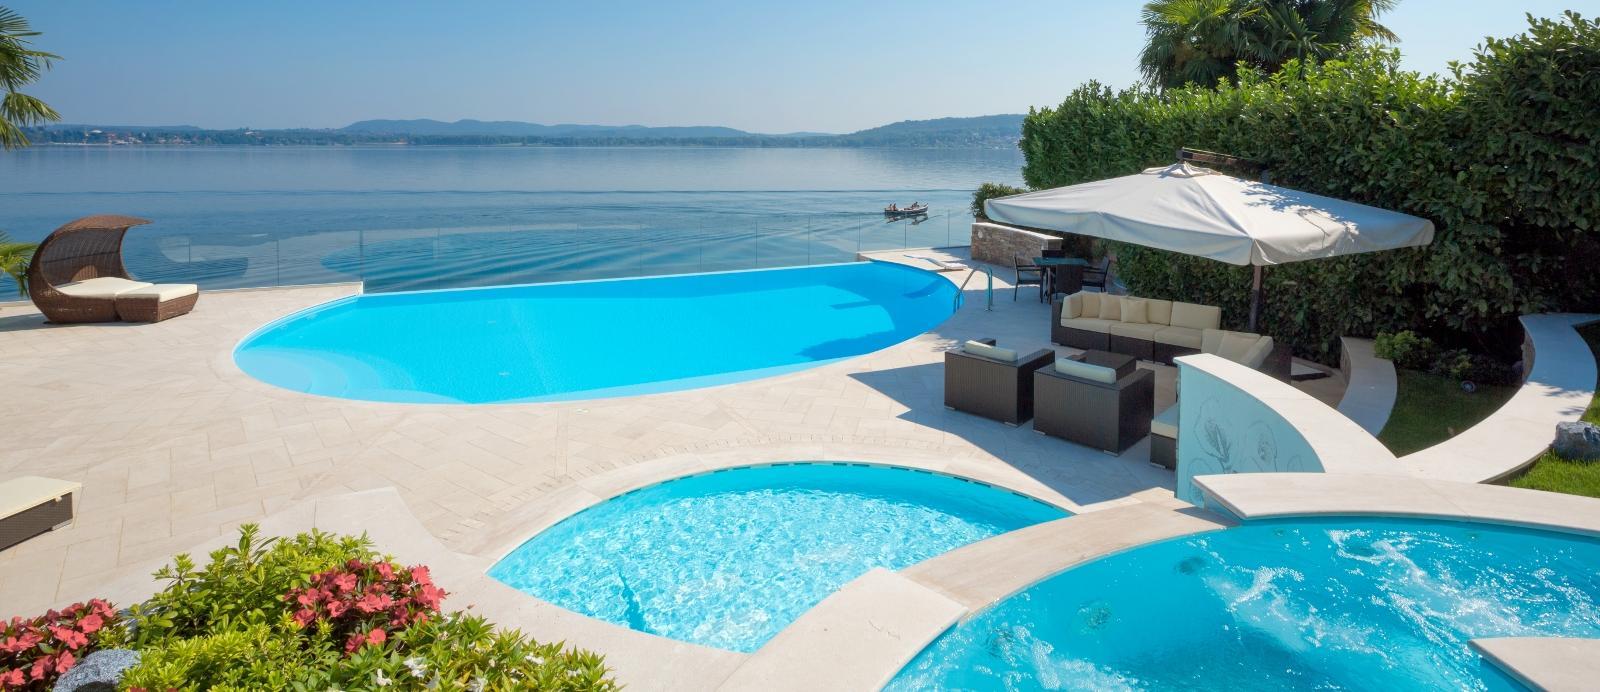 Casa moderna roma italy offerta piscine interrate for Busatta piscine prezzi